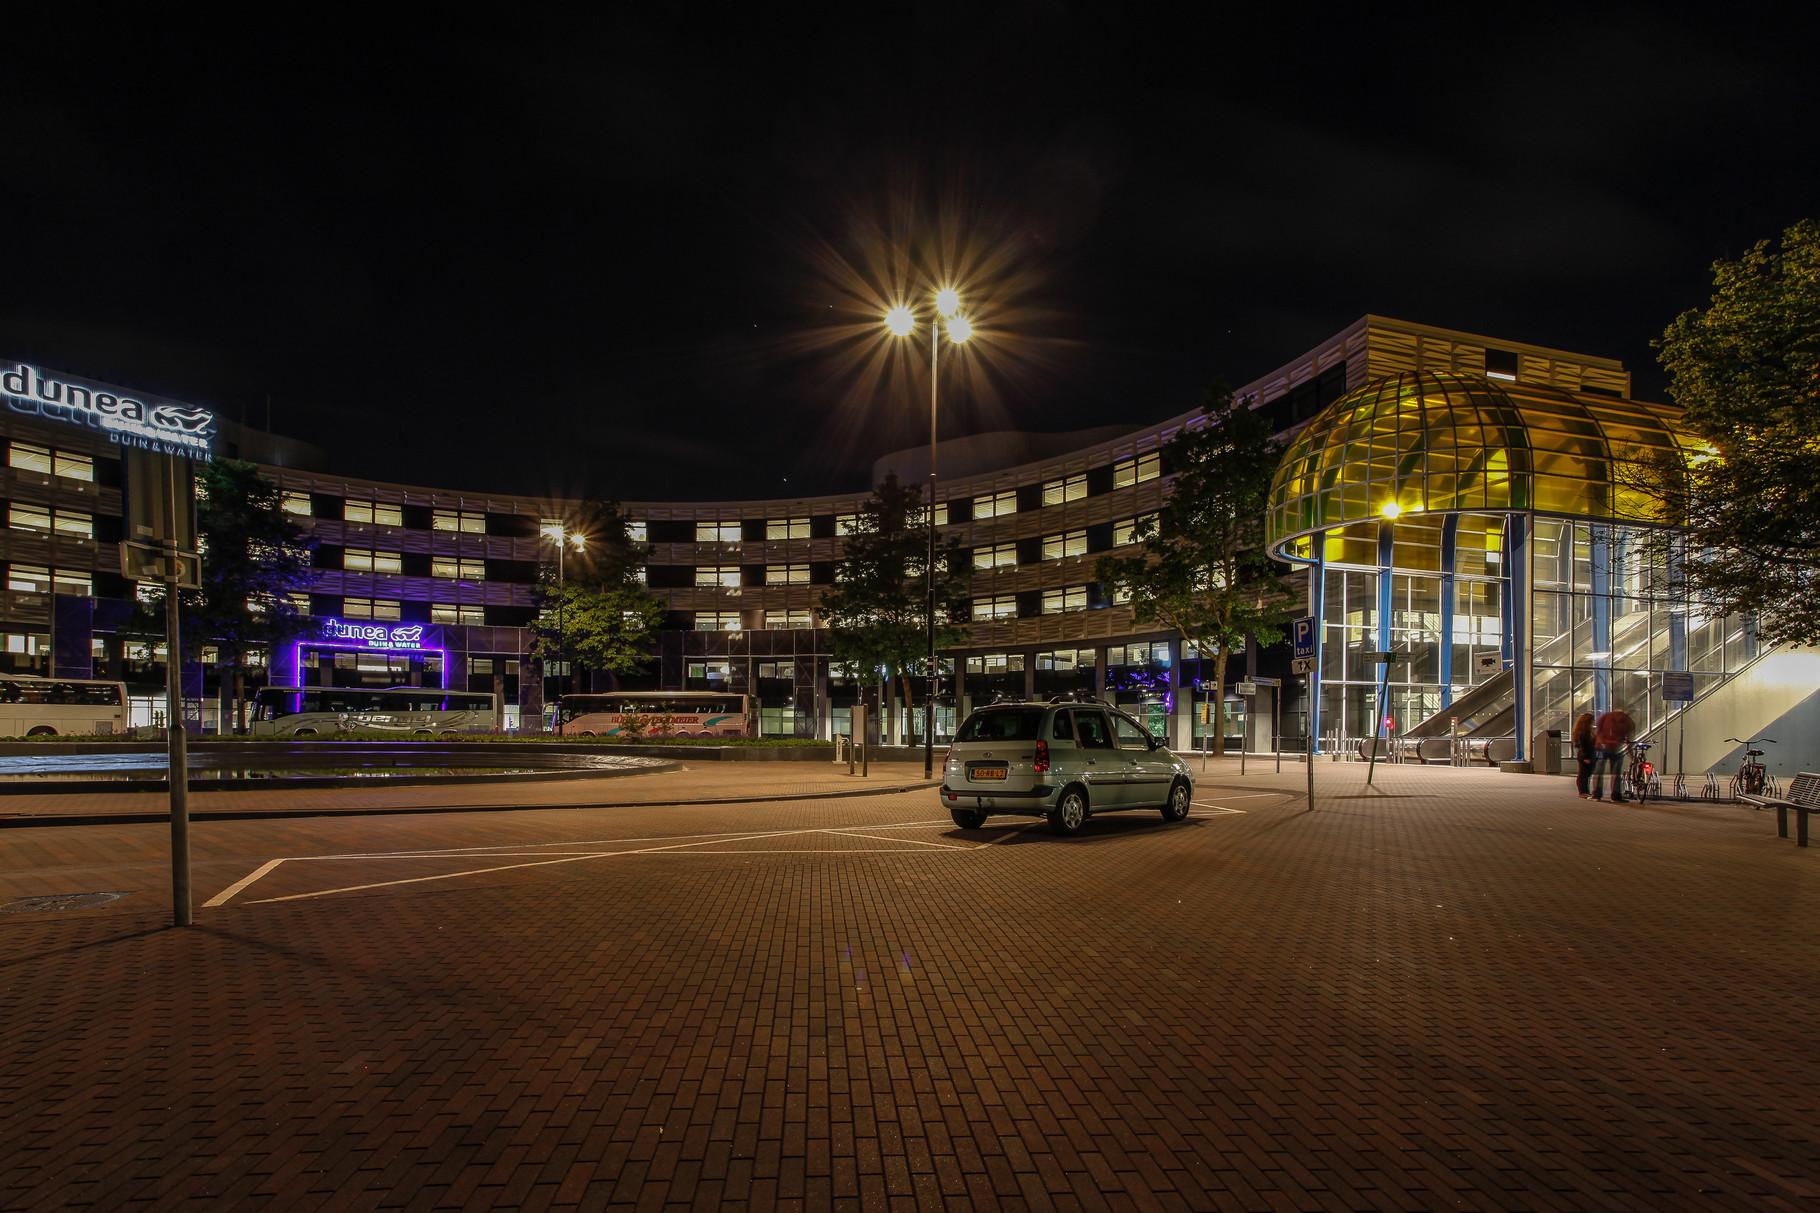 Nachtfoto Dunea en Mandelabrug - DOKOE Fotografie